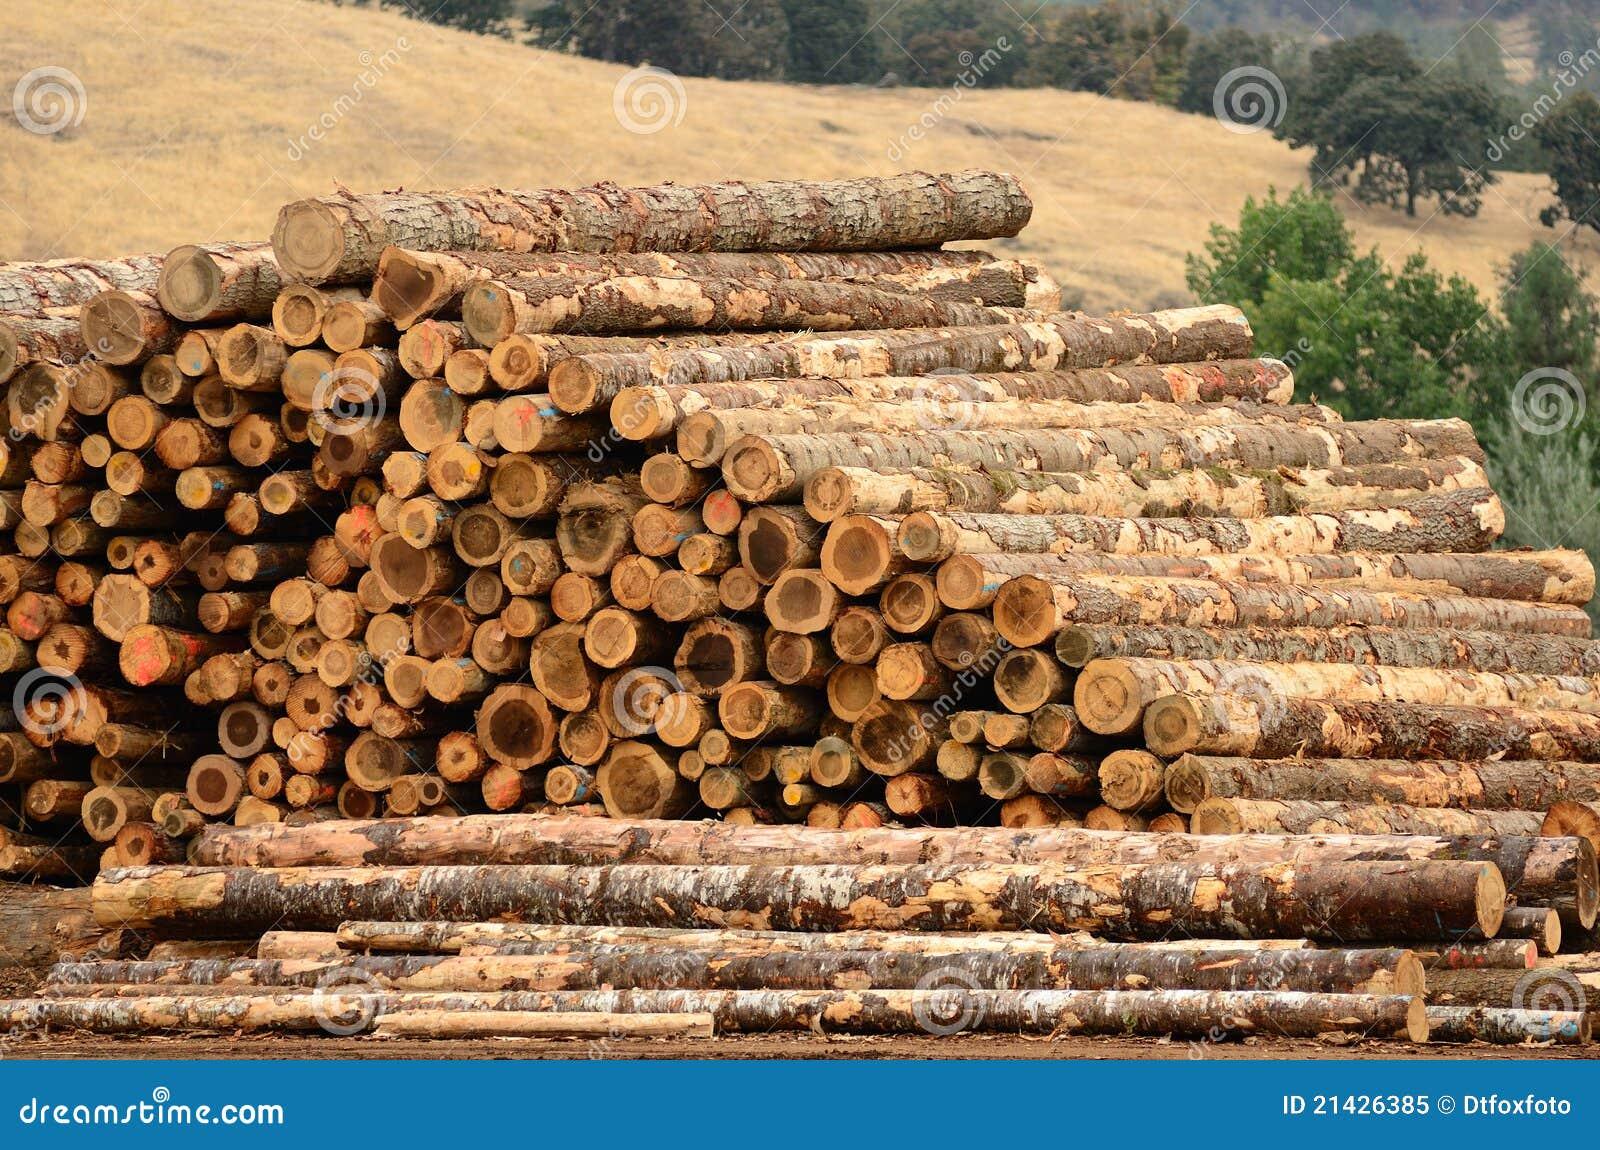 Log Yard Royalty Free Stock Photo Image 21426385